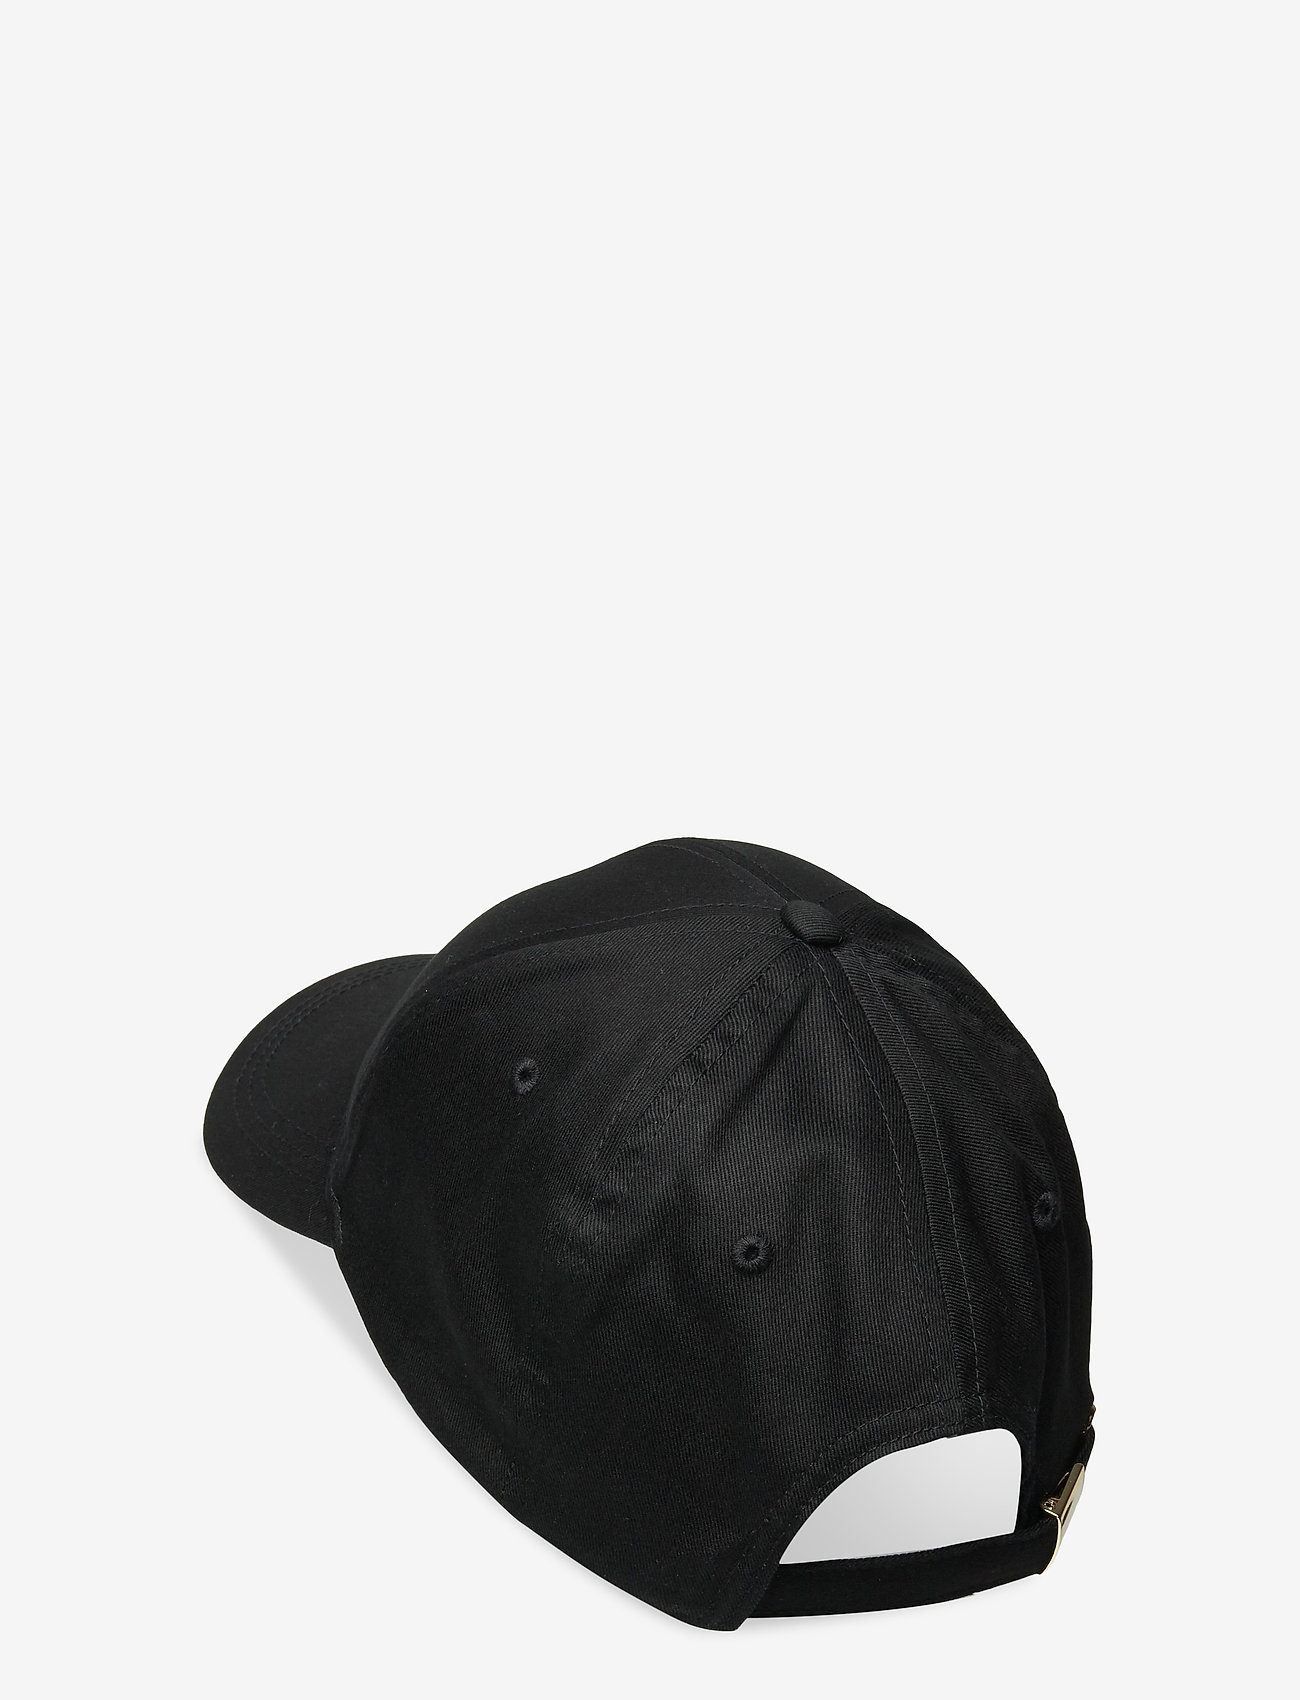 Calvin Klein - RE-LOCK BB CAP - kasketter - ck black - 1